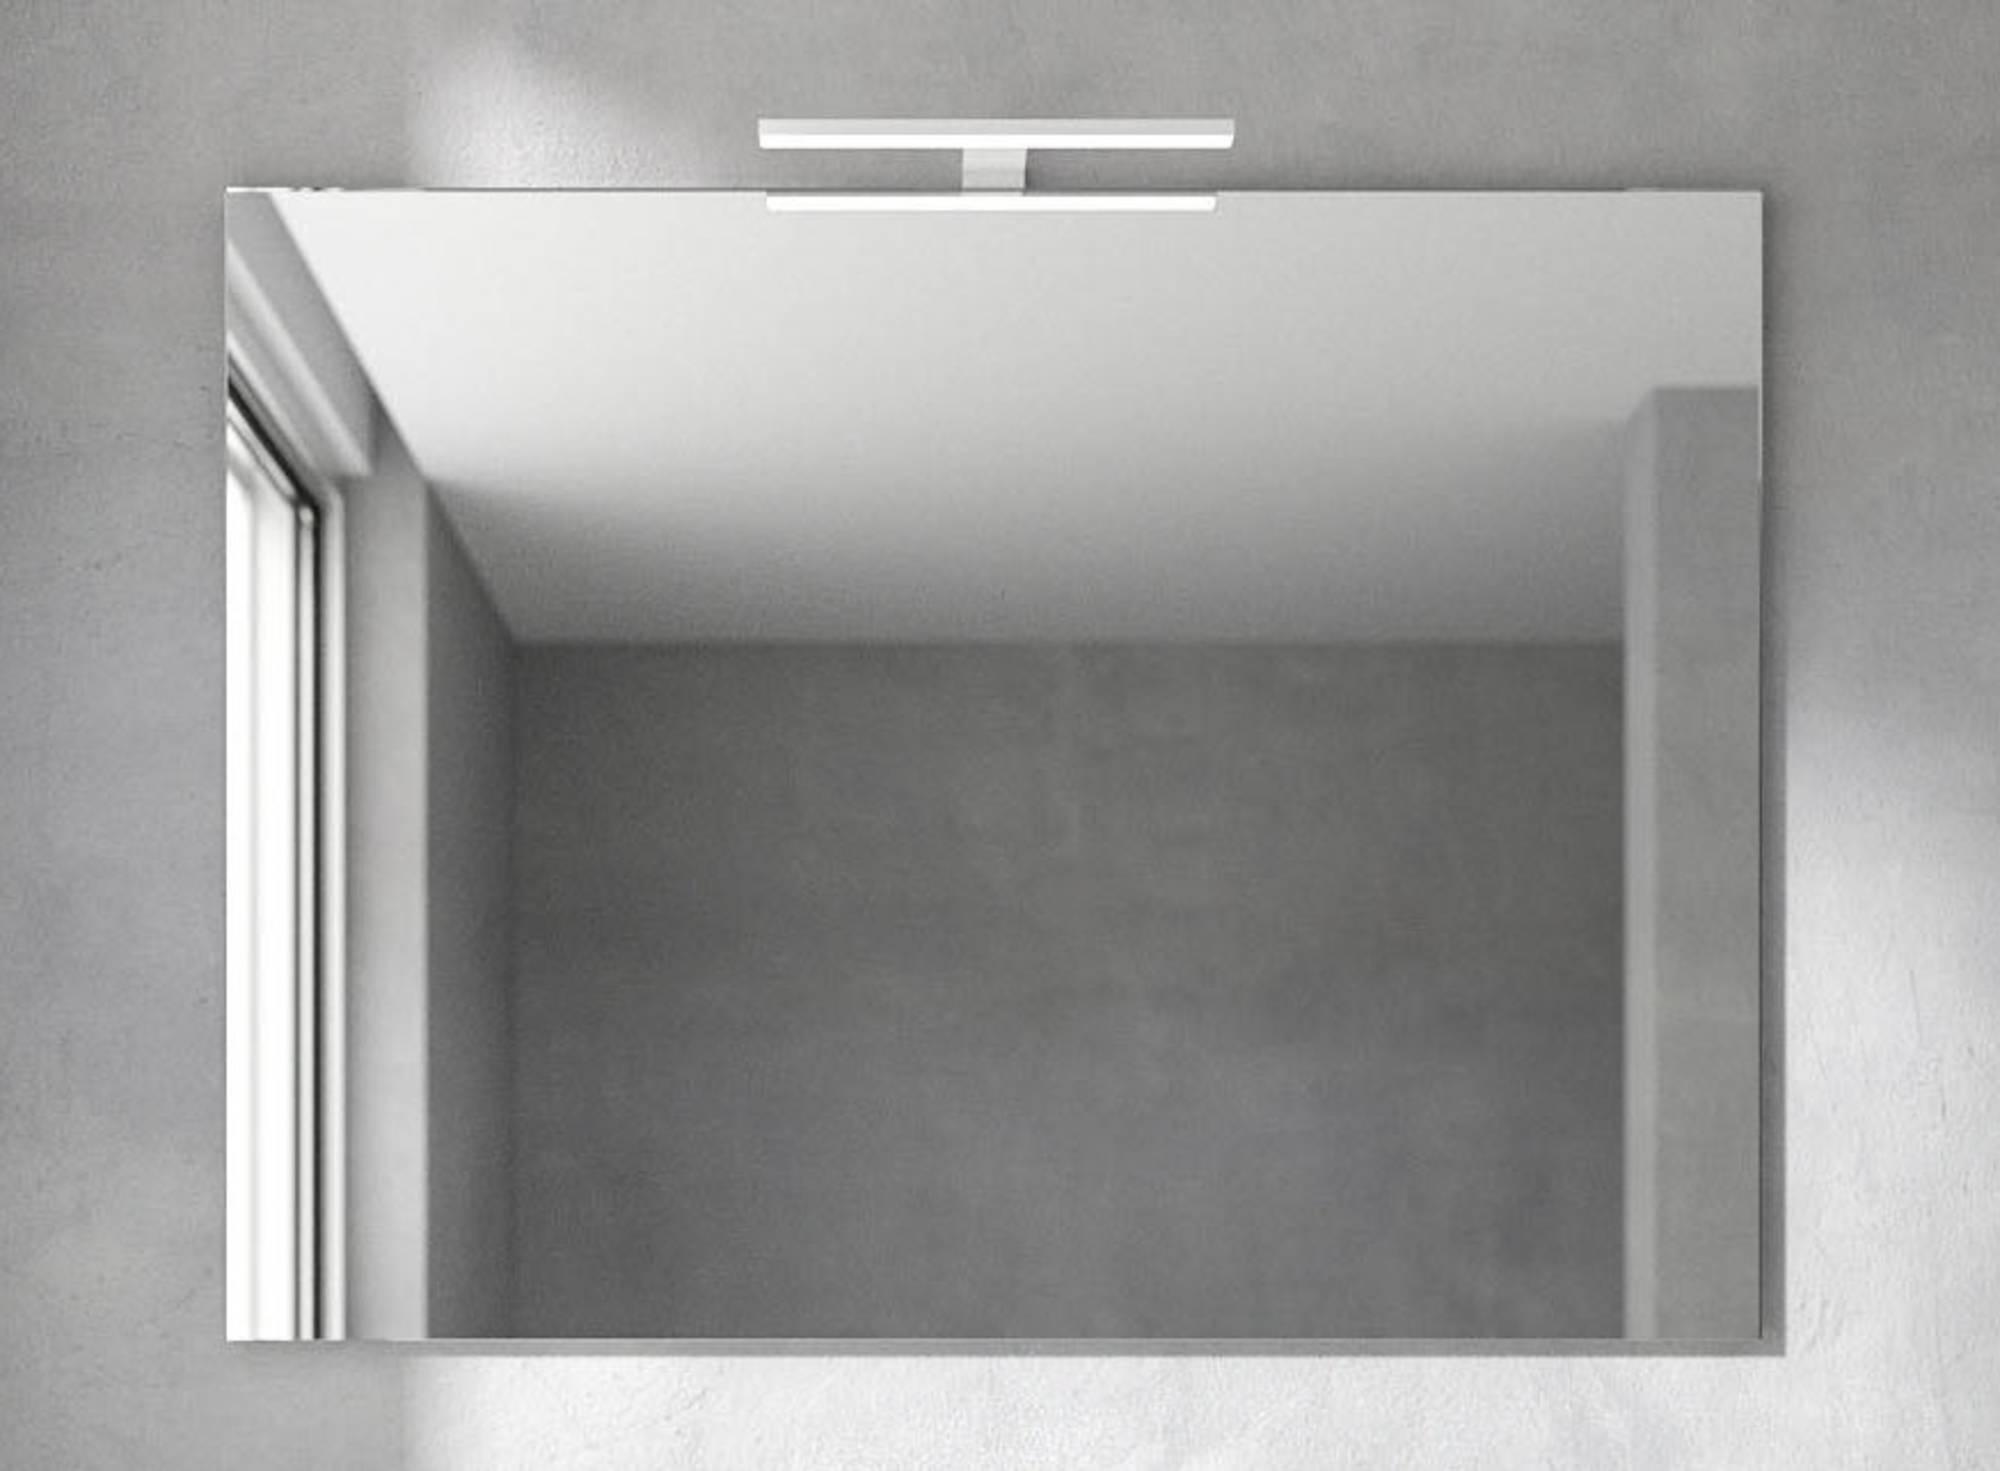 Saniselect Bali Spiegel 100x70x2,6 cm